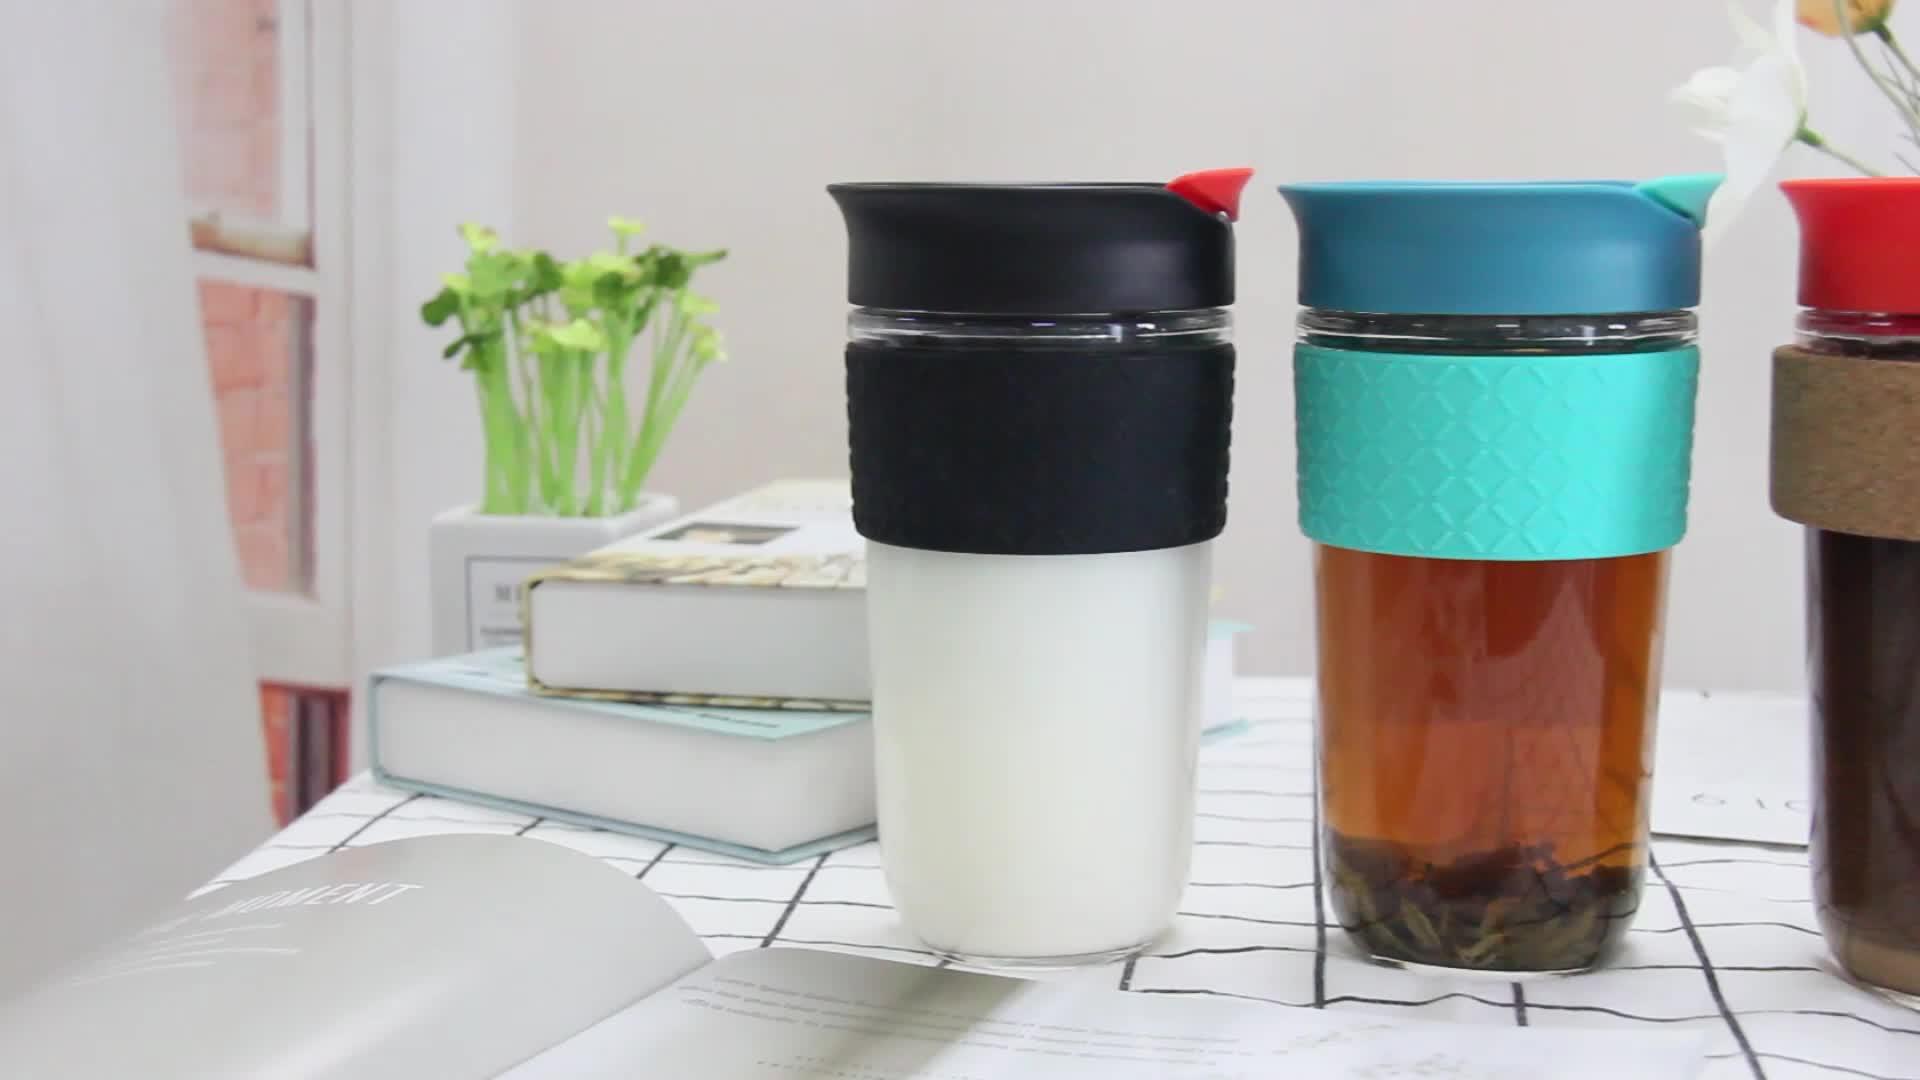 नई आगमन सोडा लीमा ग्लास चाय कप चाय झरनी के साथ 18oz और सिलिकॉन आस्तीन, स्पष्ट गिलास चाय तर करने वाला कप